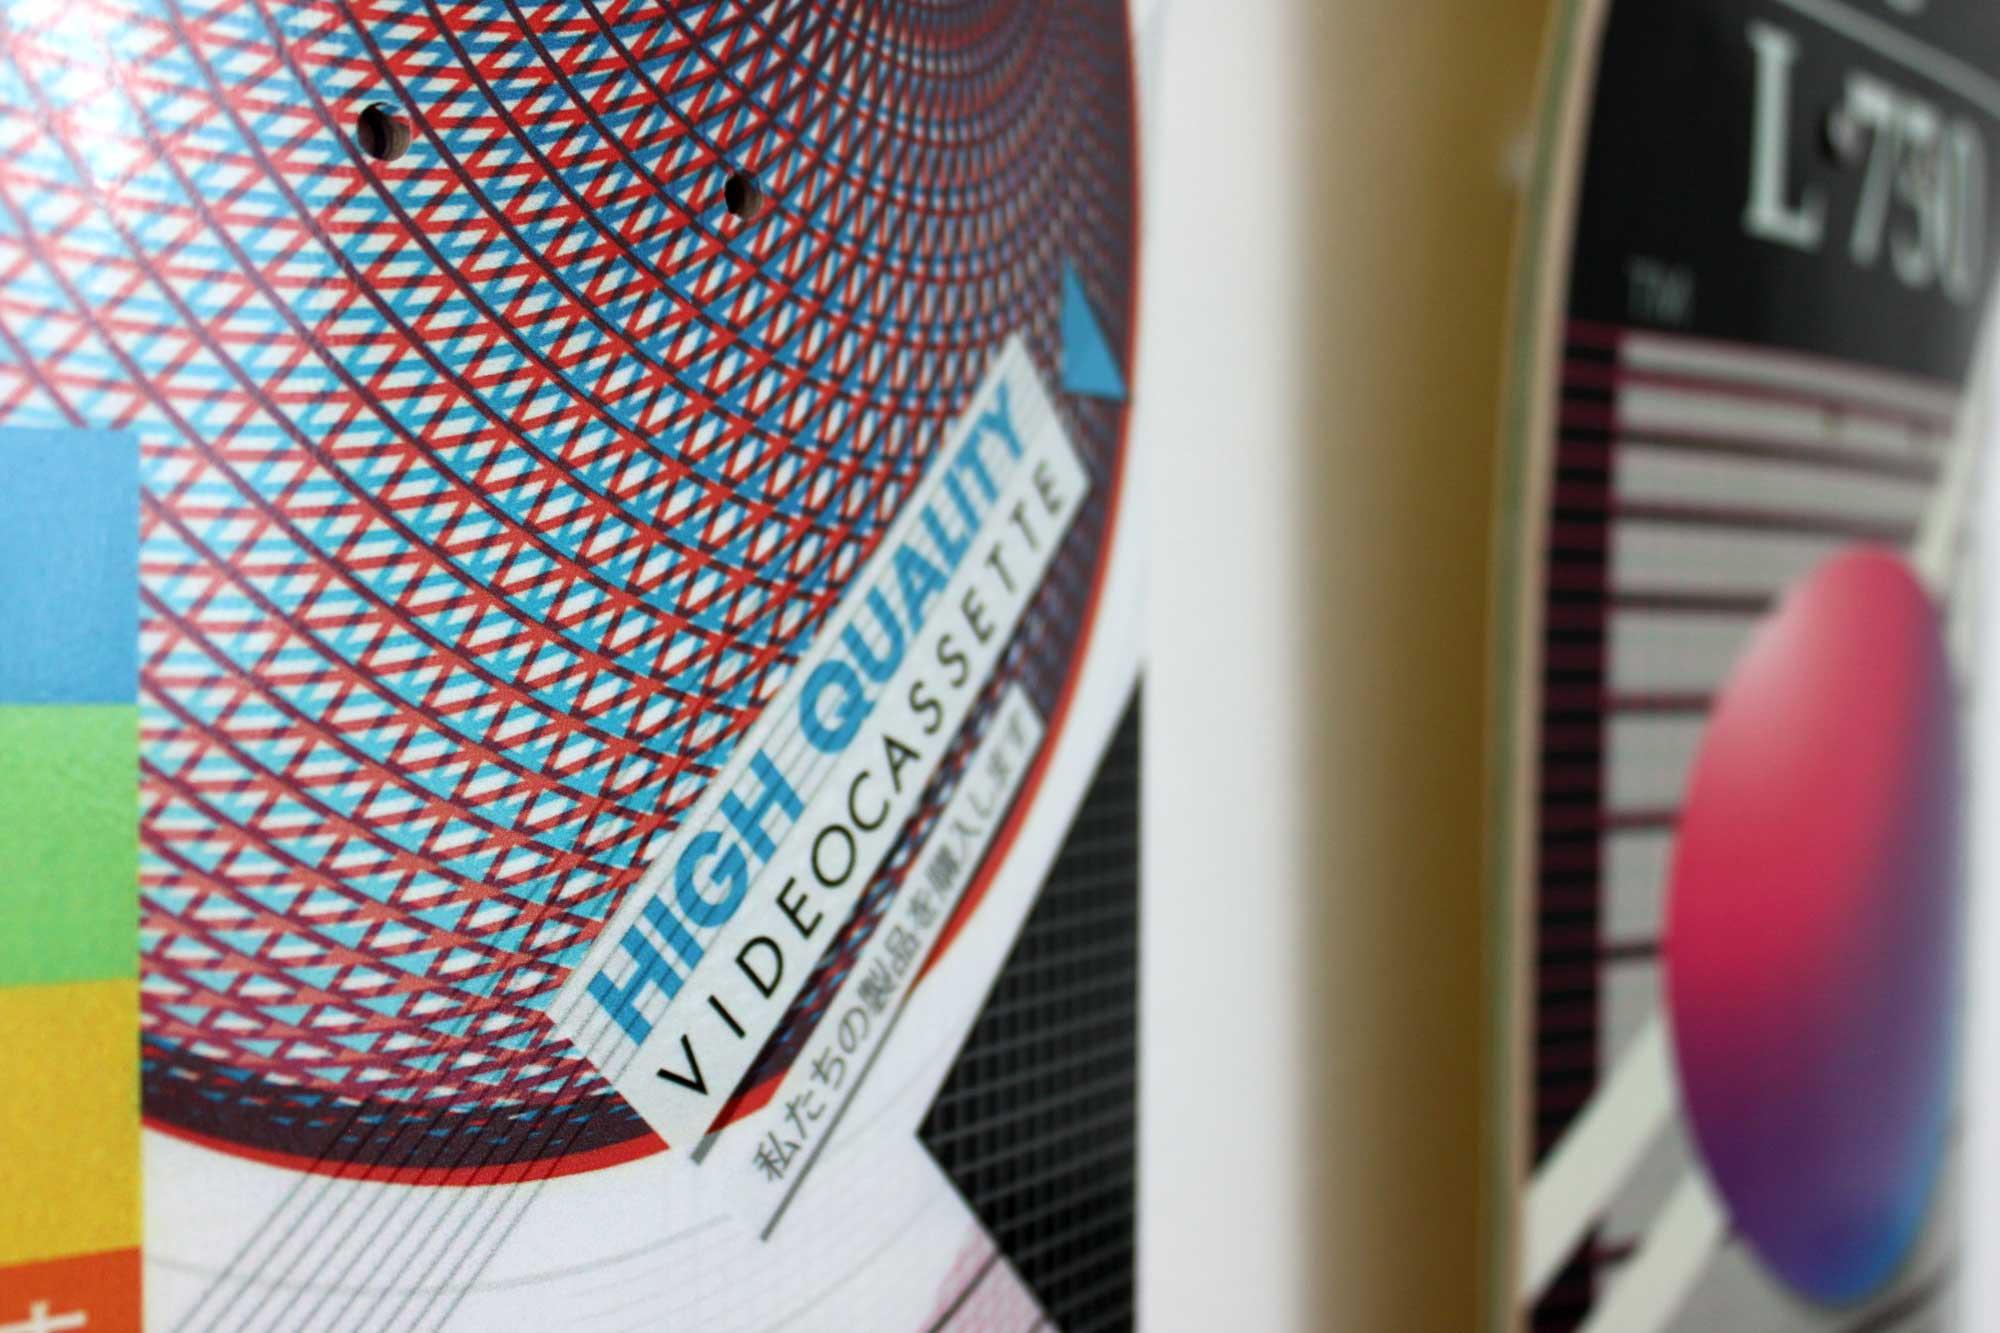 03-vhs-polaroid-skateboard-detail-graphics-design-photo-deck